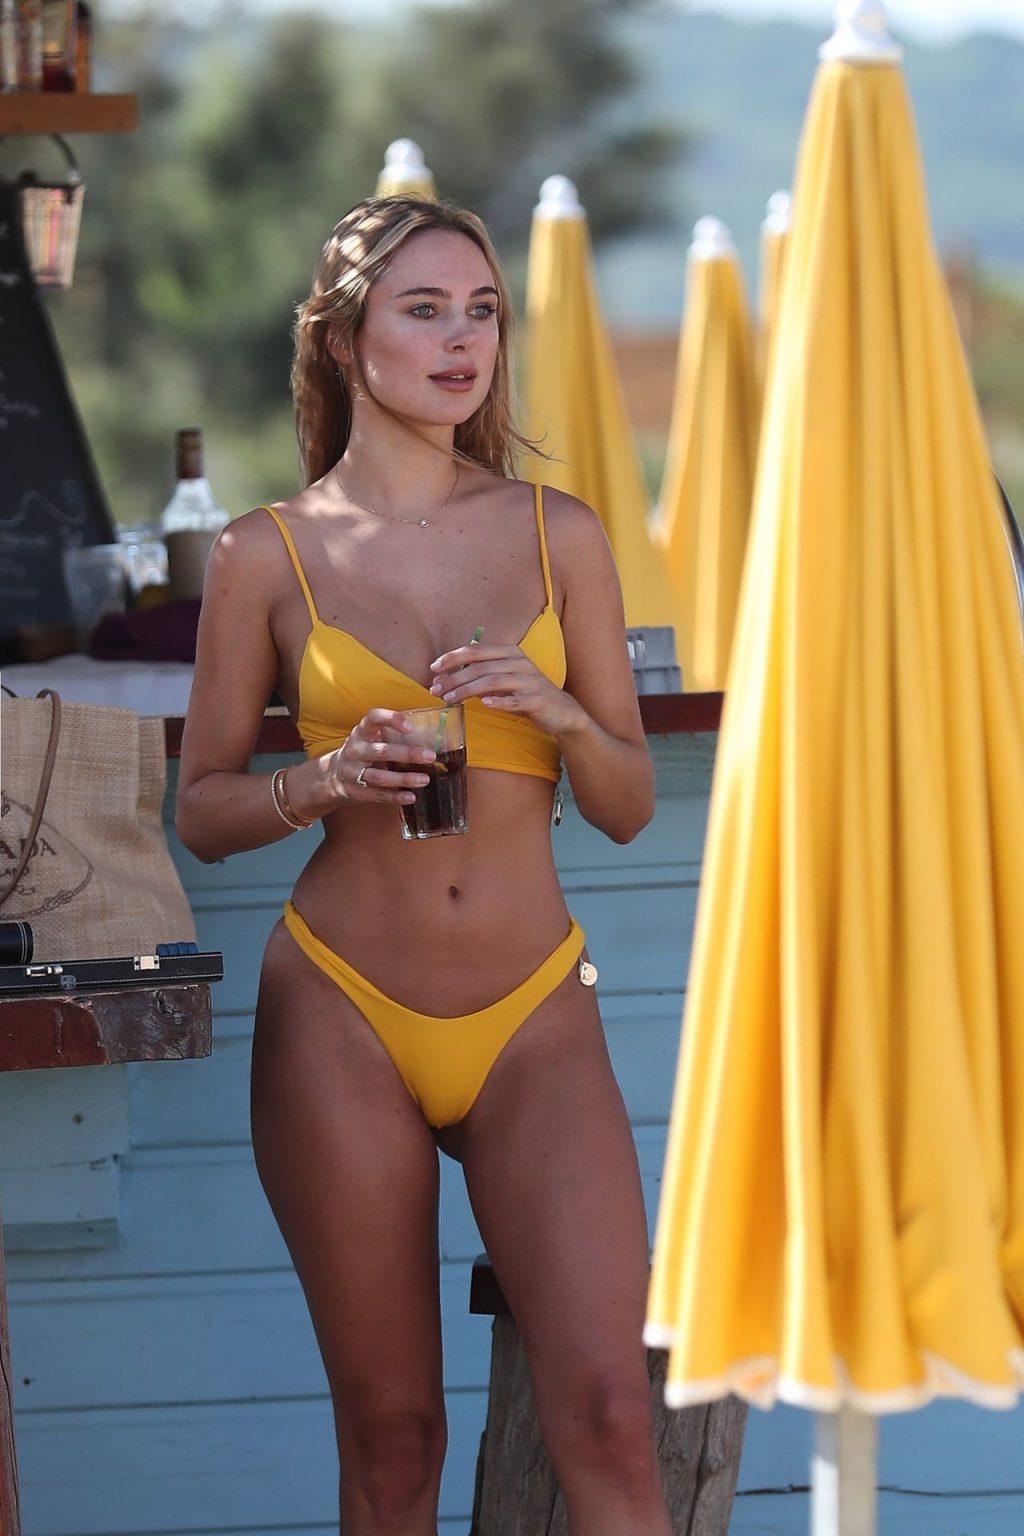 Kimberley Garner Looks Super Hot in a Yellow Bikini (31 Photos)